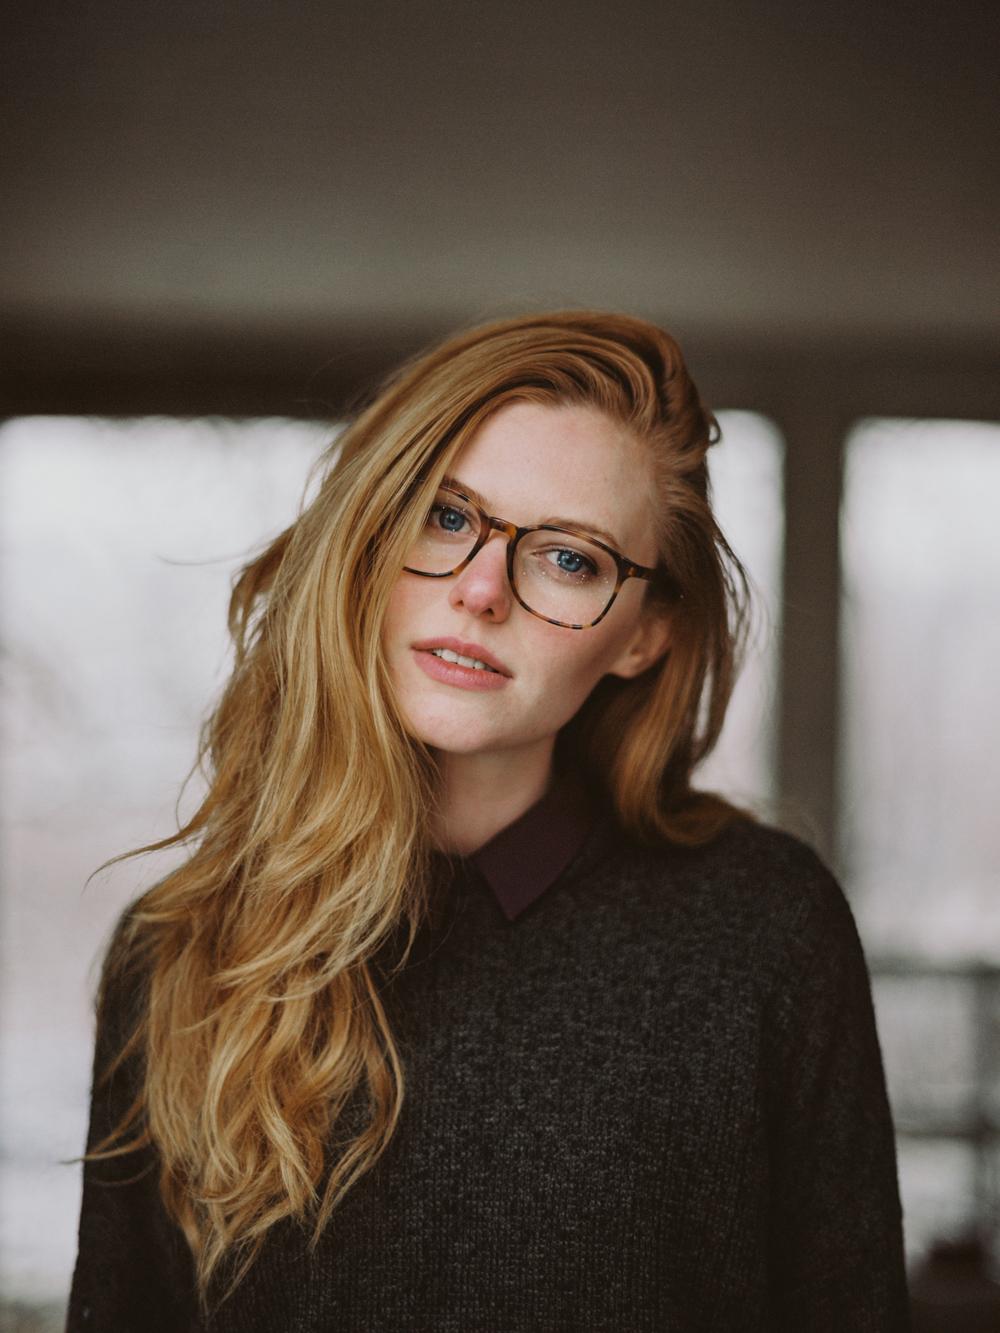 Kelly Smith - Kodak Portra 160